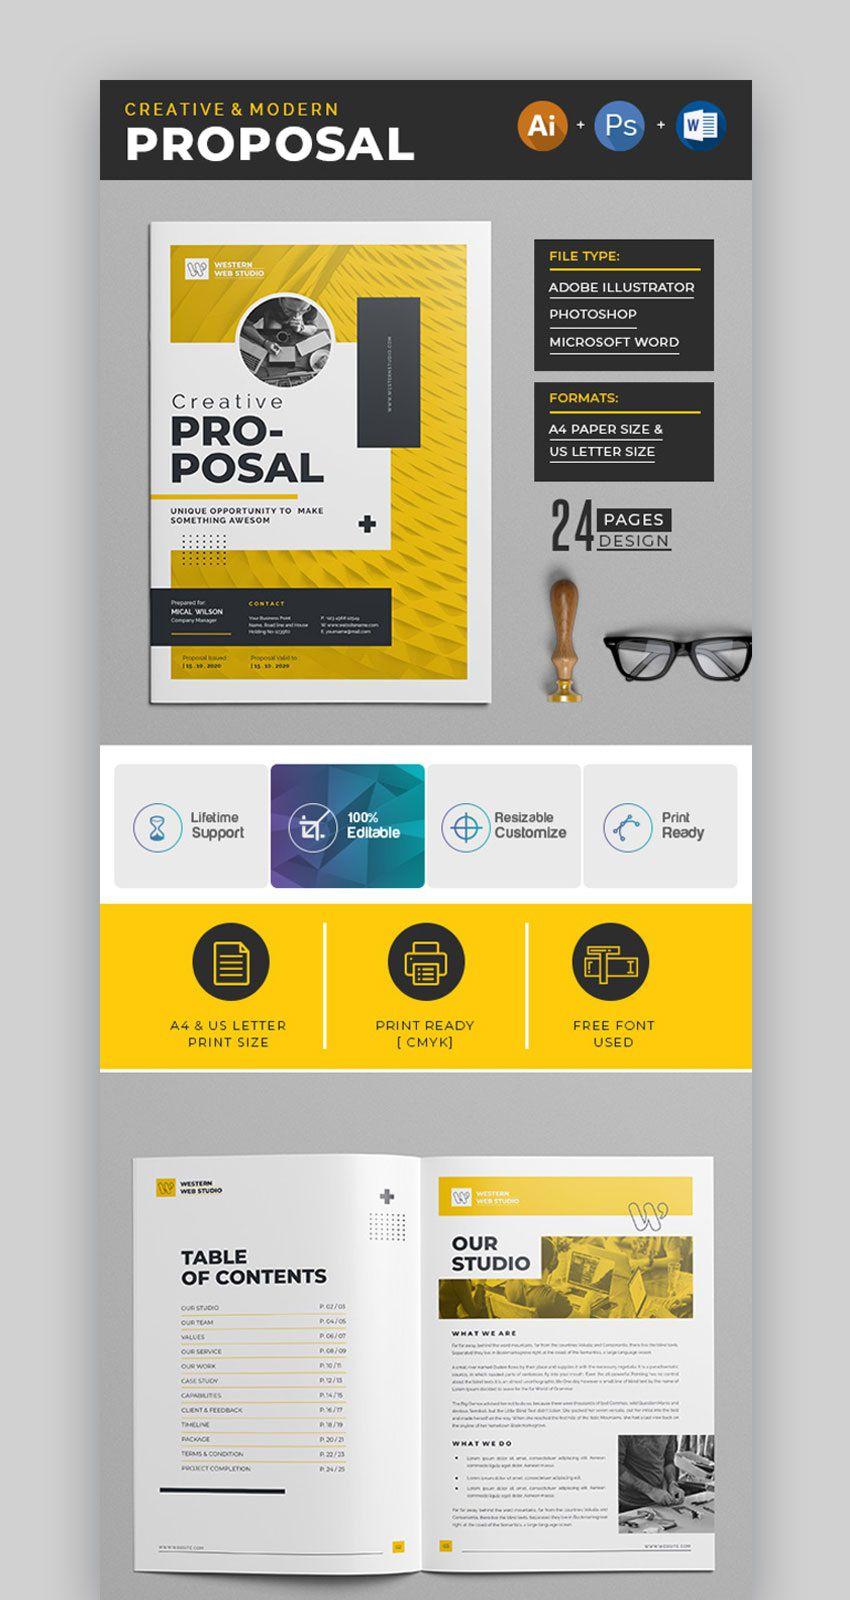 009 Astounding Web Design Proposal Template Free Highest Quality  Freelance DownloadFull